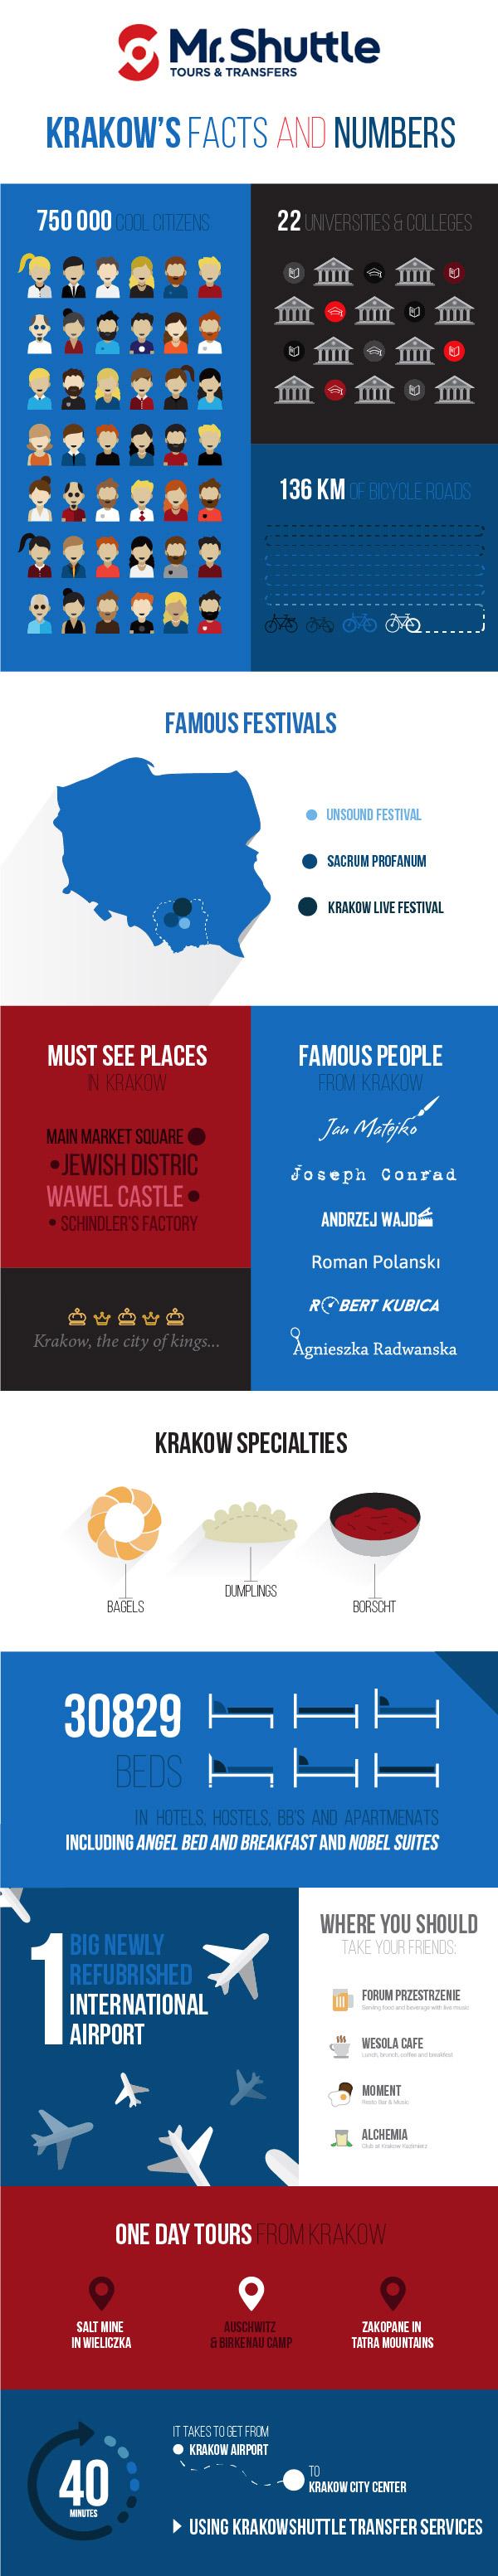 krakow info grapics